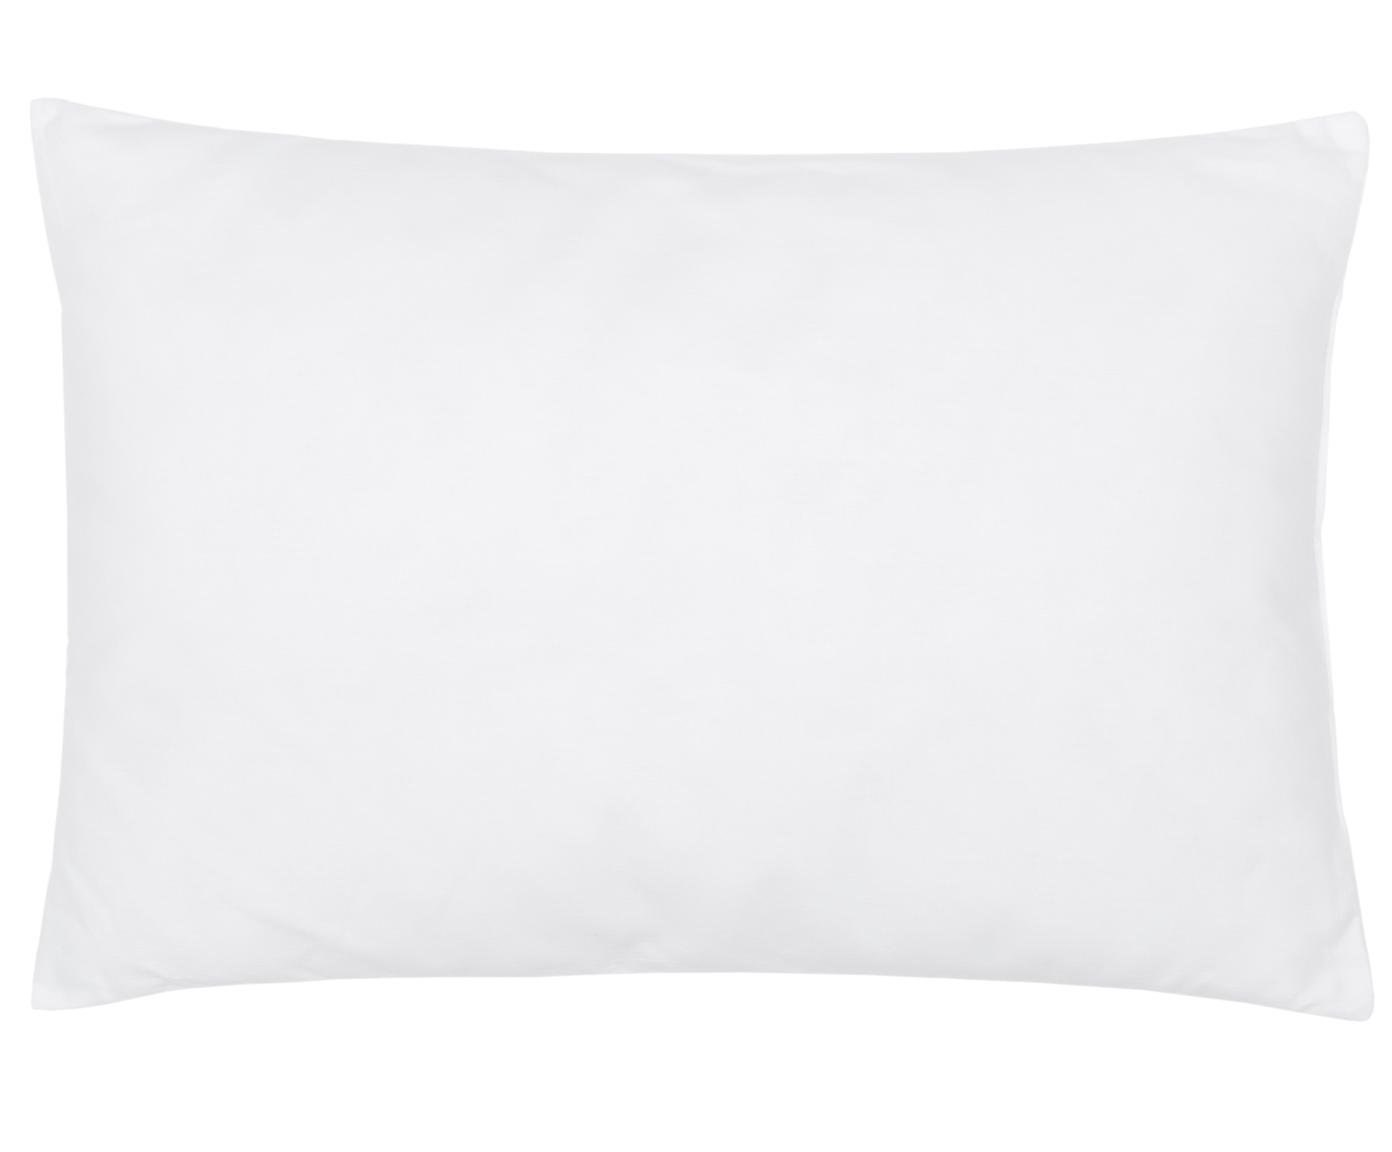 Imbottitura per cuscini in microfibra Sia, 40 x 60, Bianco, Larg. 40 x Lung. 60 cm